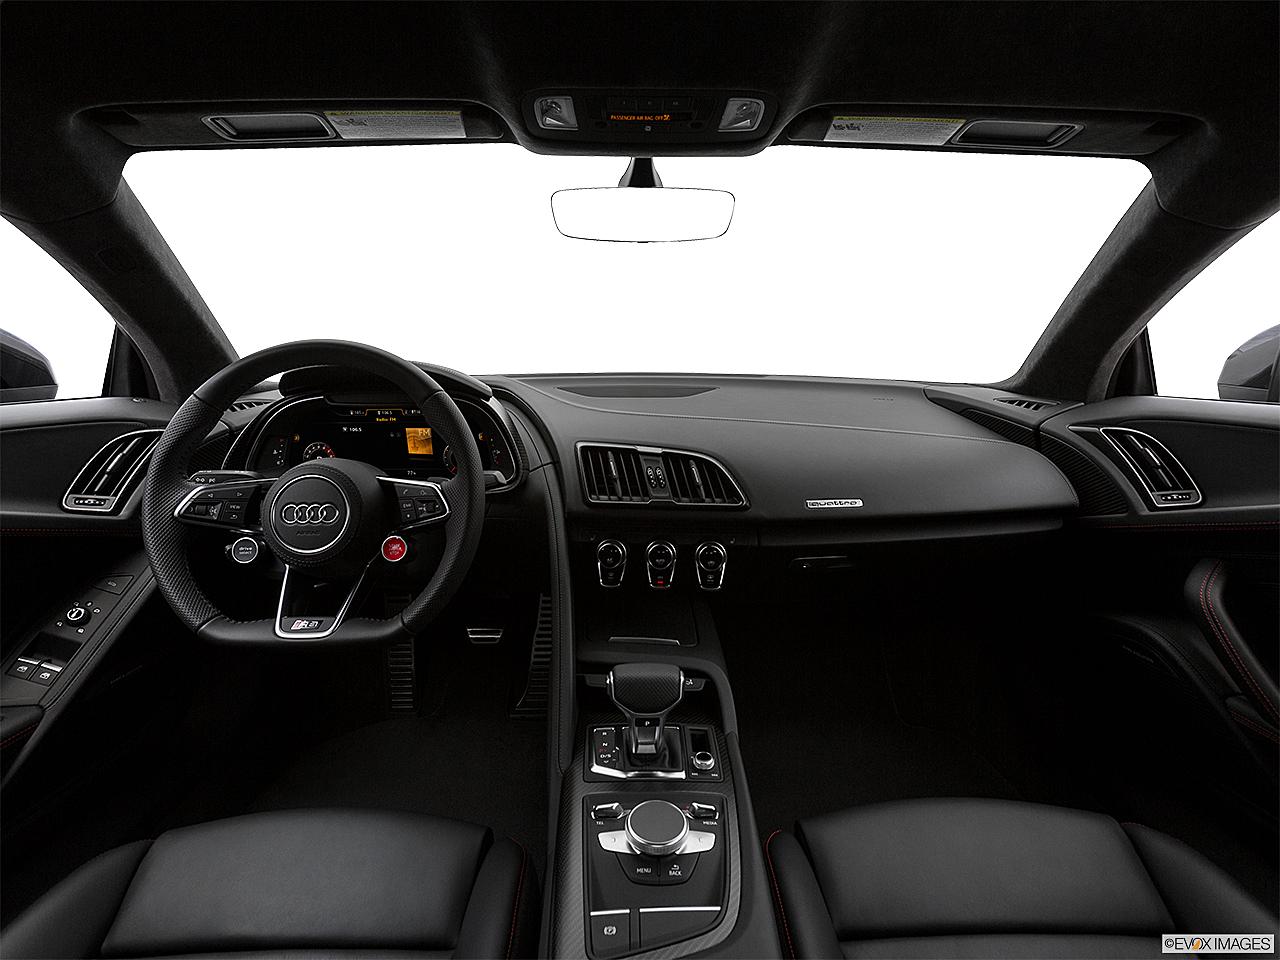 2018 Audi R8 Awd 5 2 Quattro V10 Plus Spyder 2dr Convertible